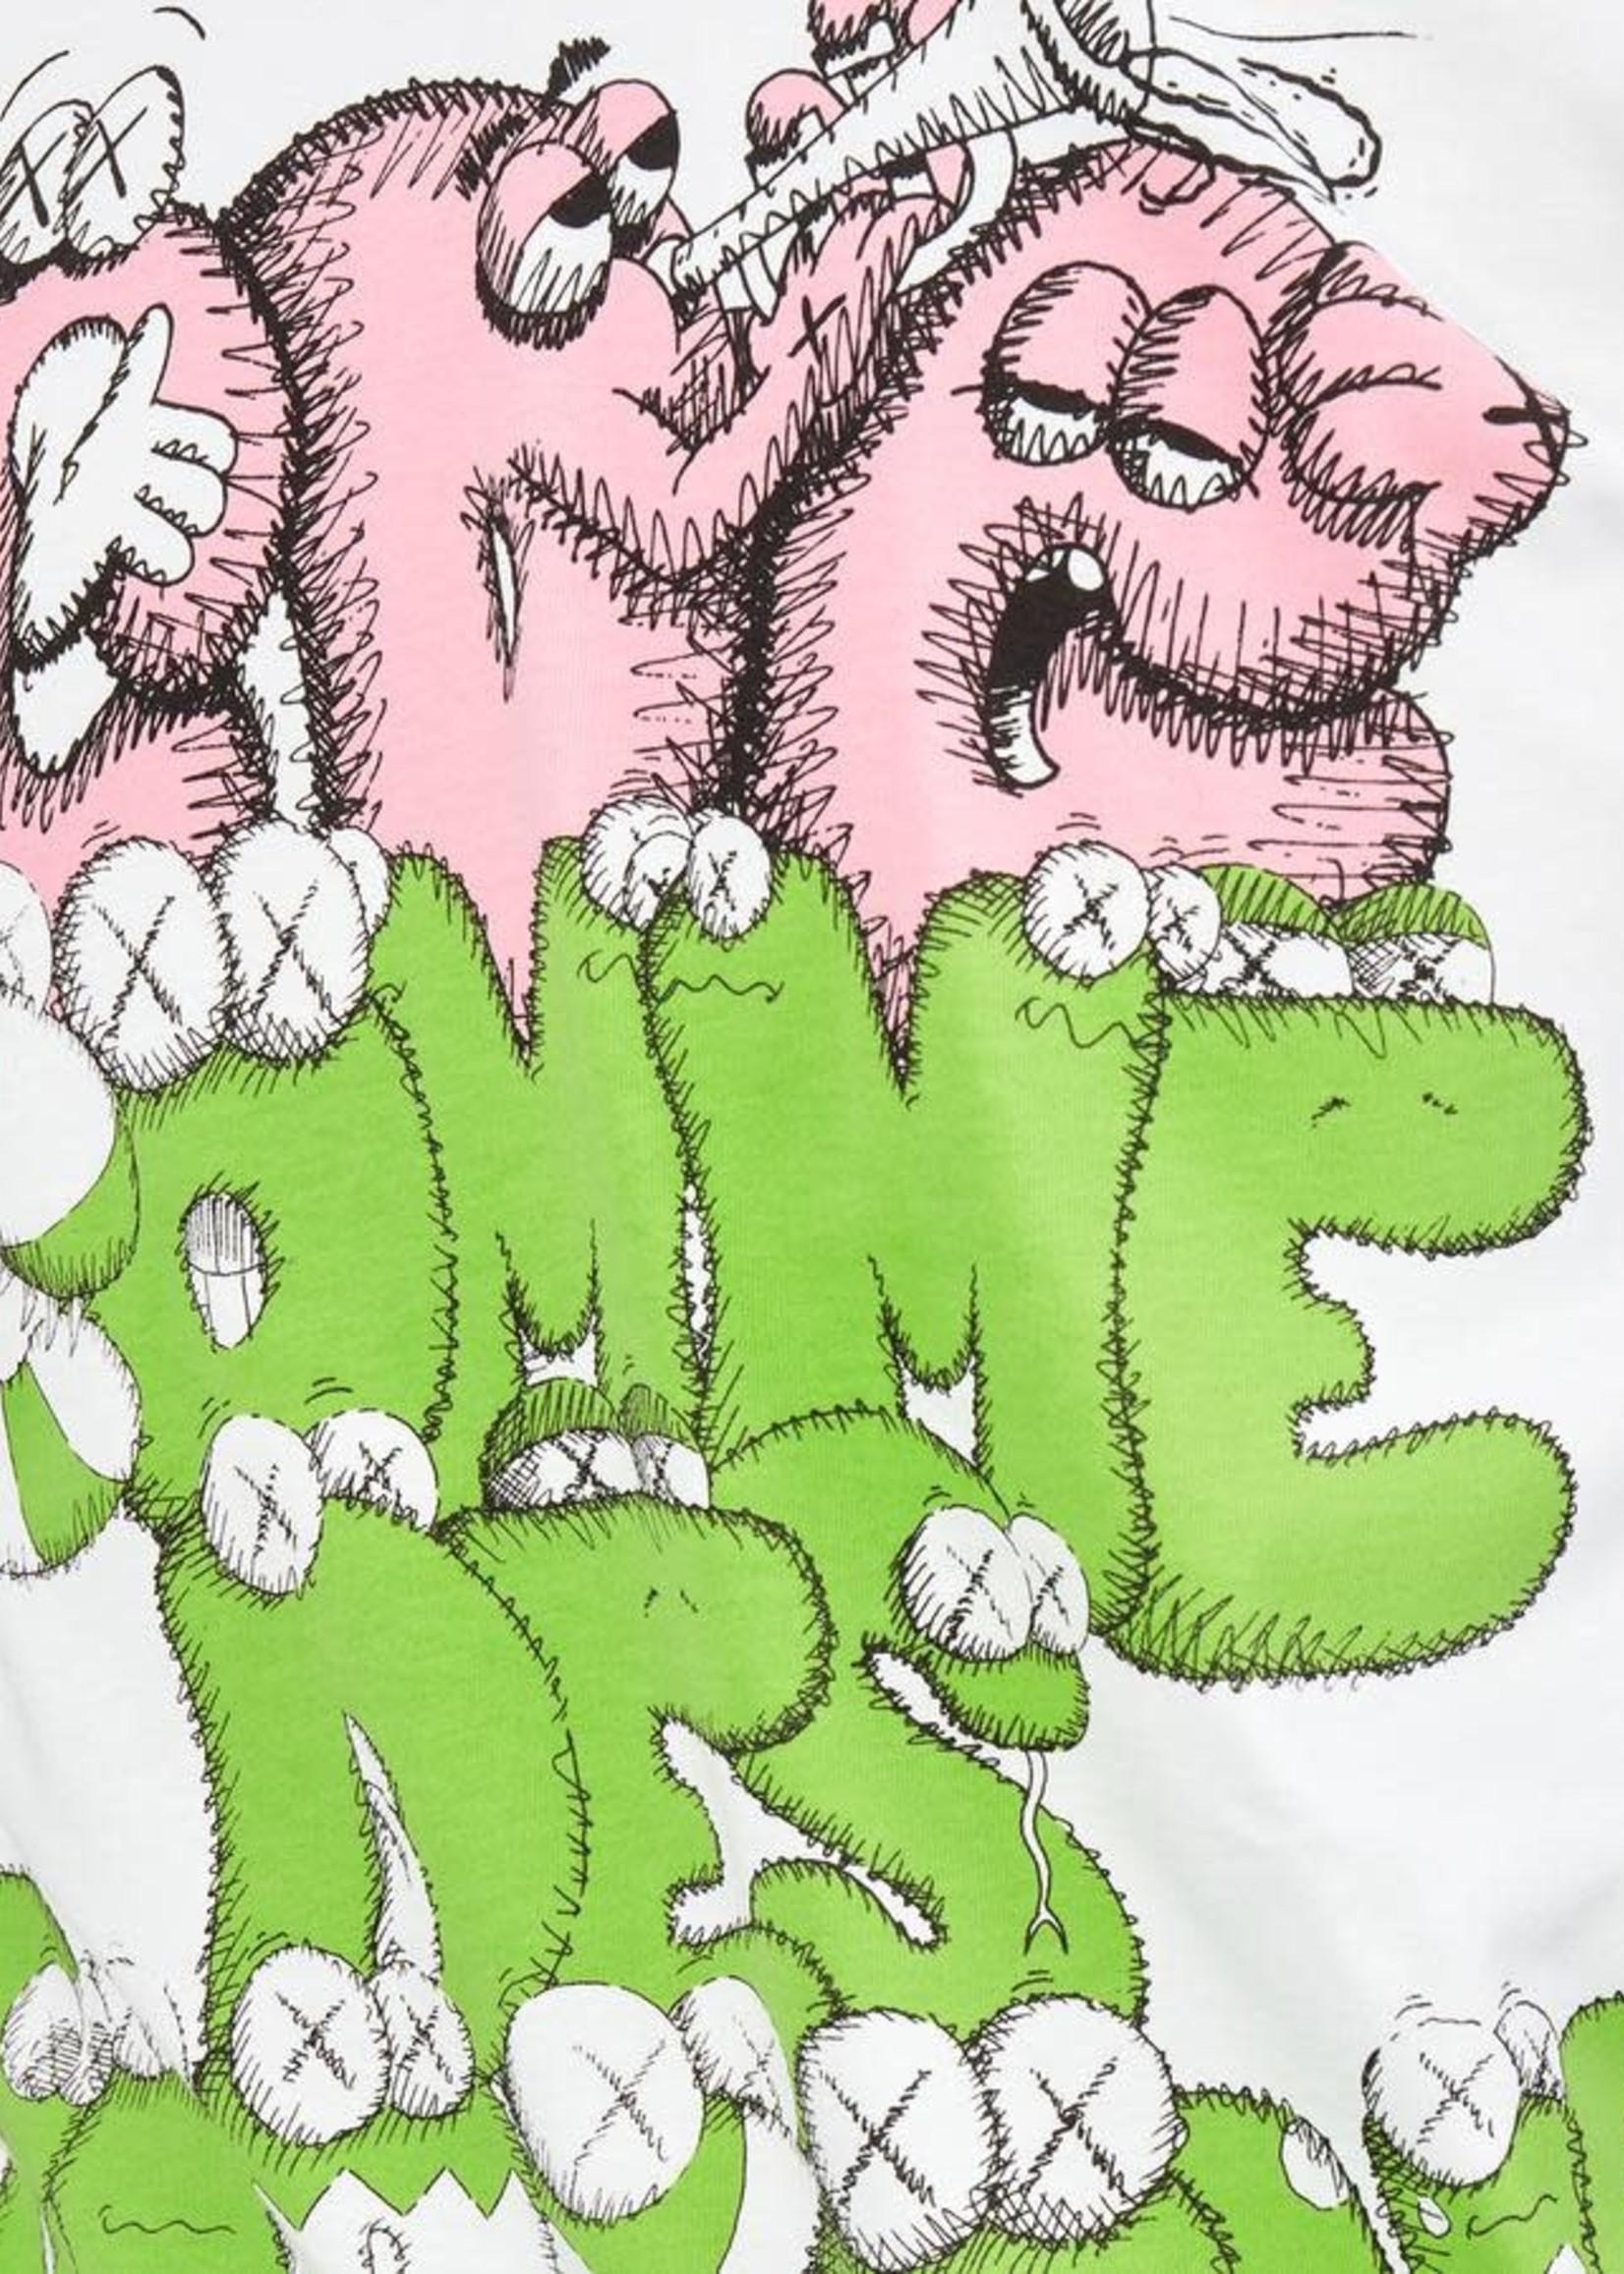 COMME des GARÇONS SHIRT CDG X KAWS Green Logo Tee